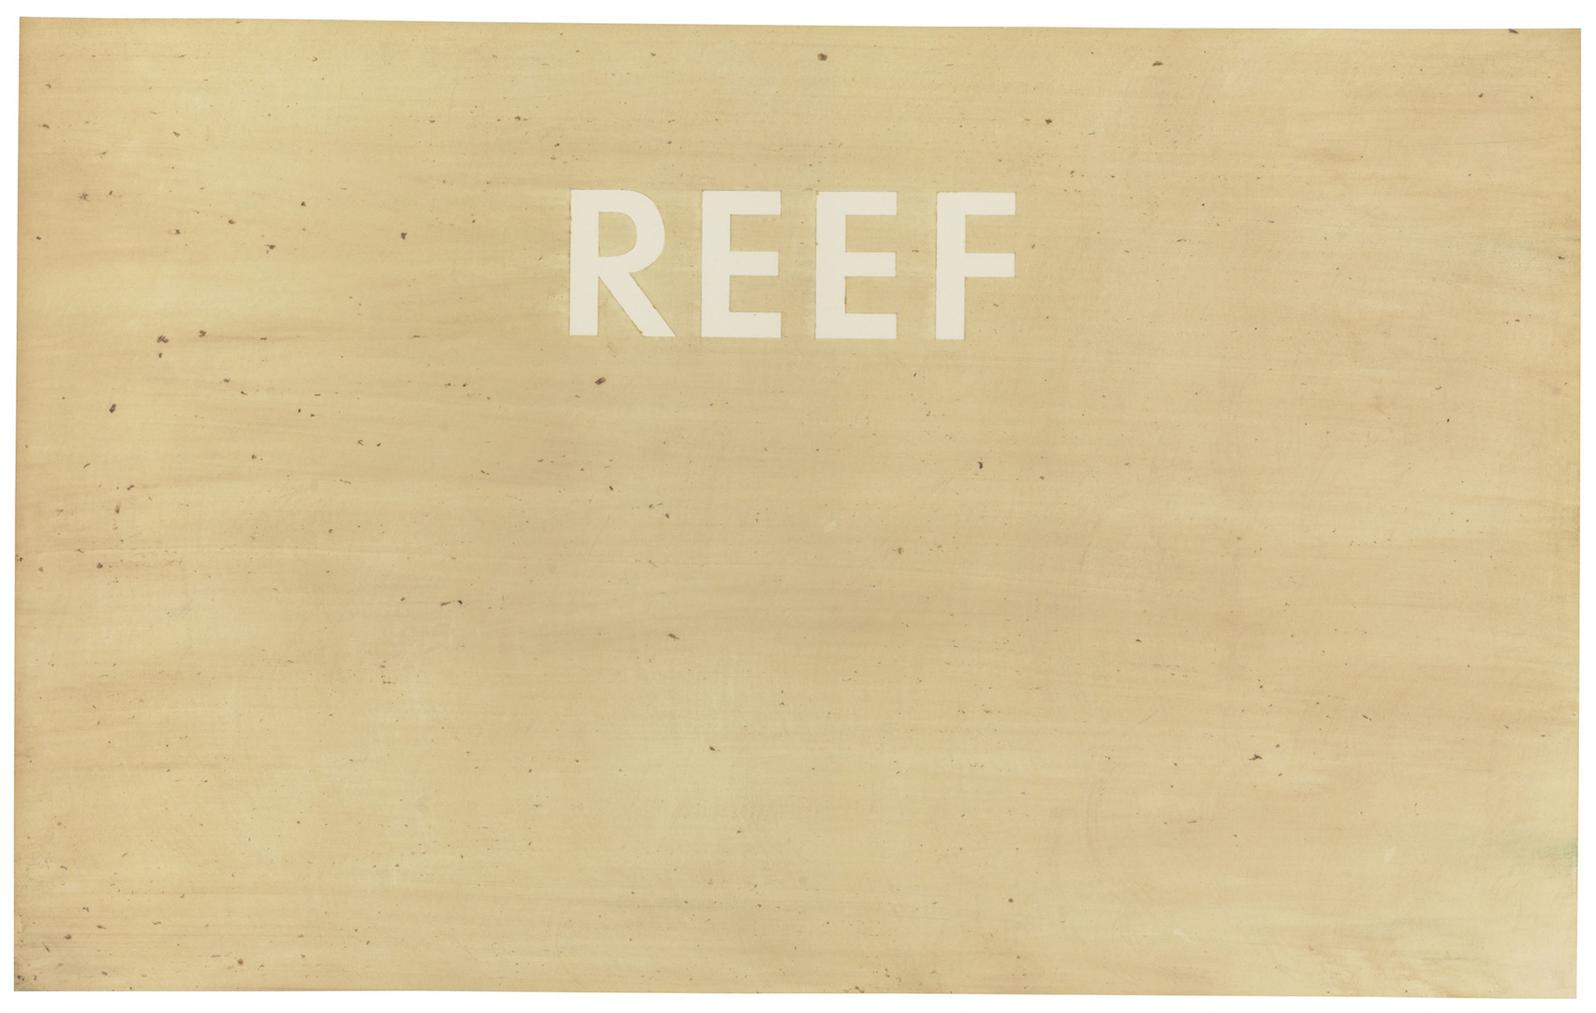 Ed Ruscha-Reef-1975